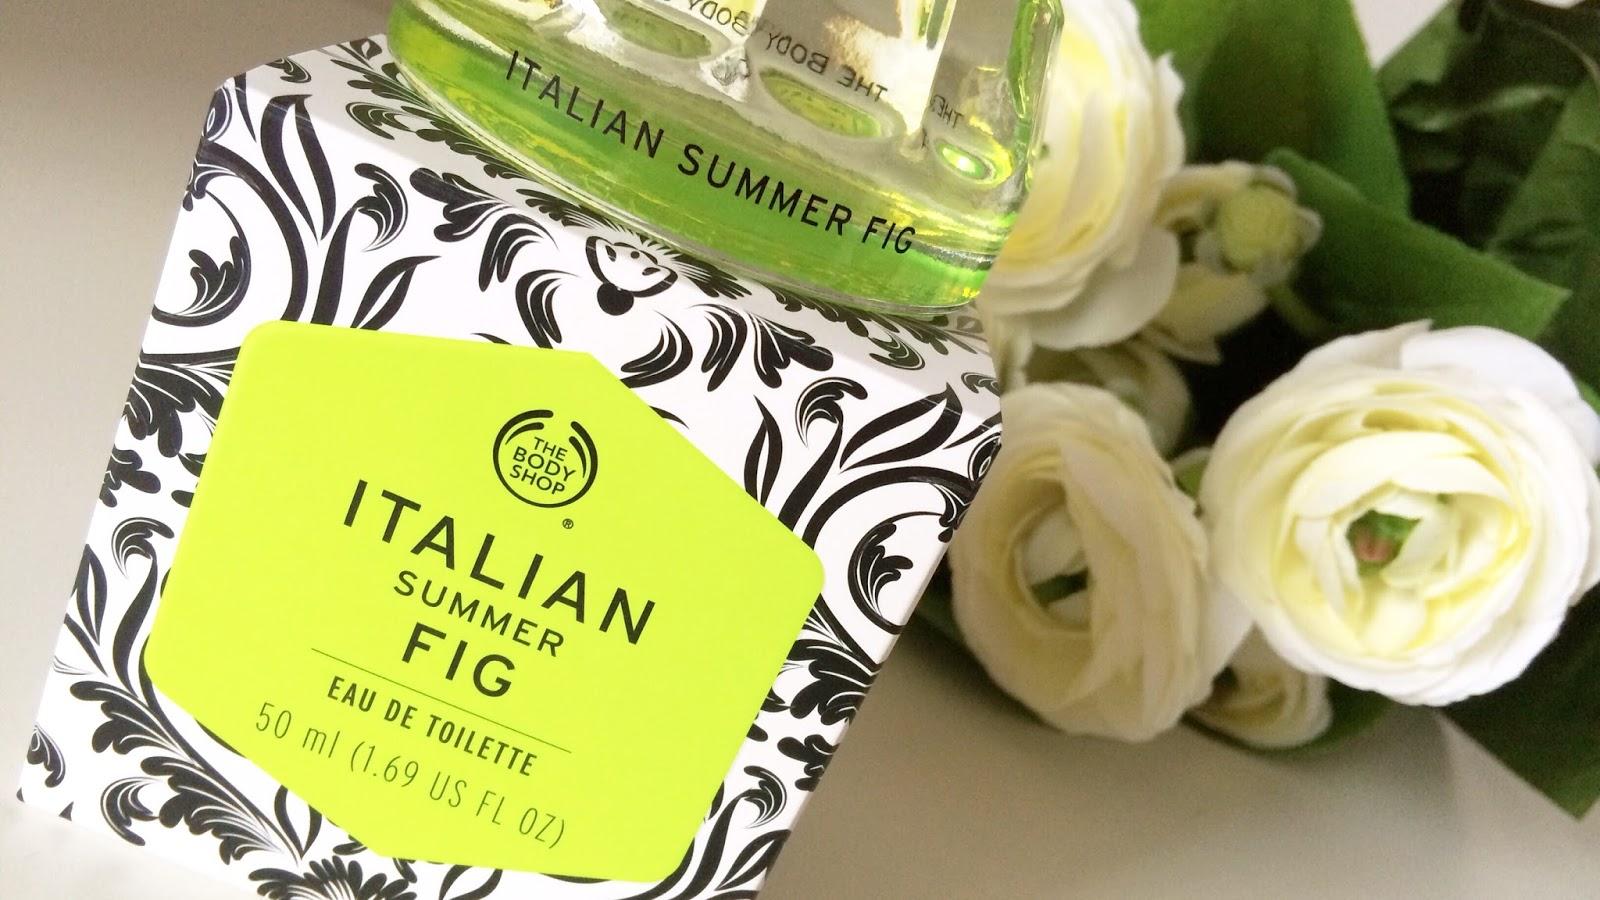 The Body Shop perfume Italian summer fig